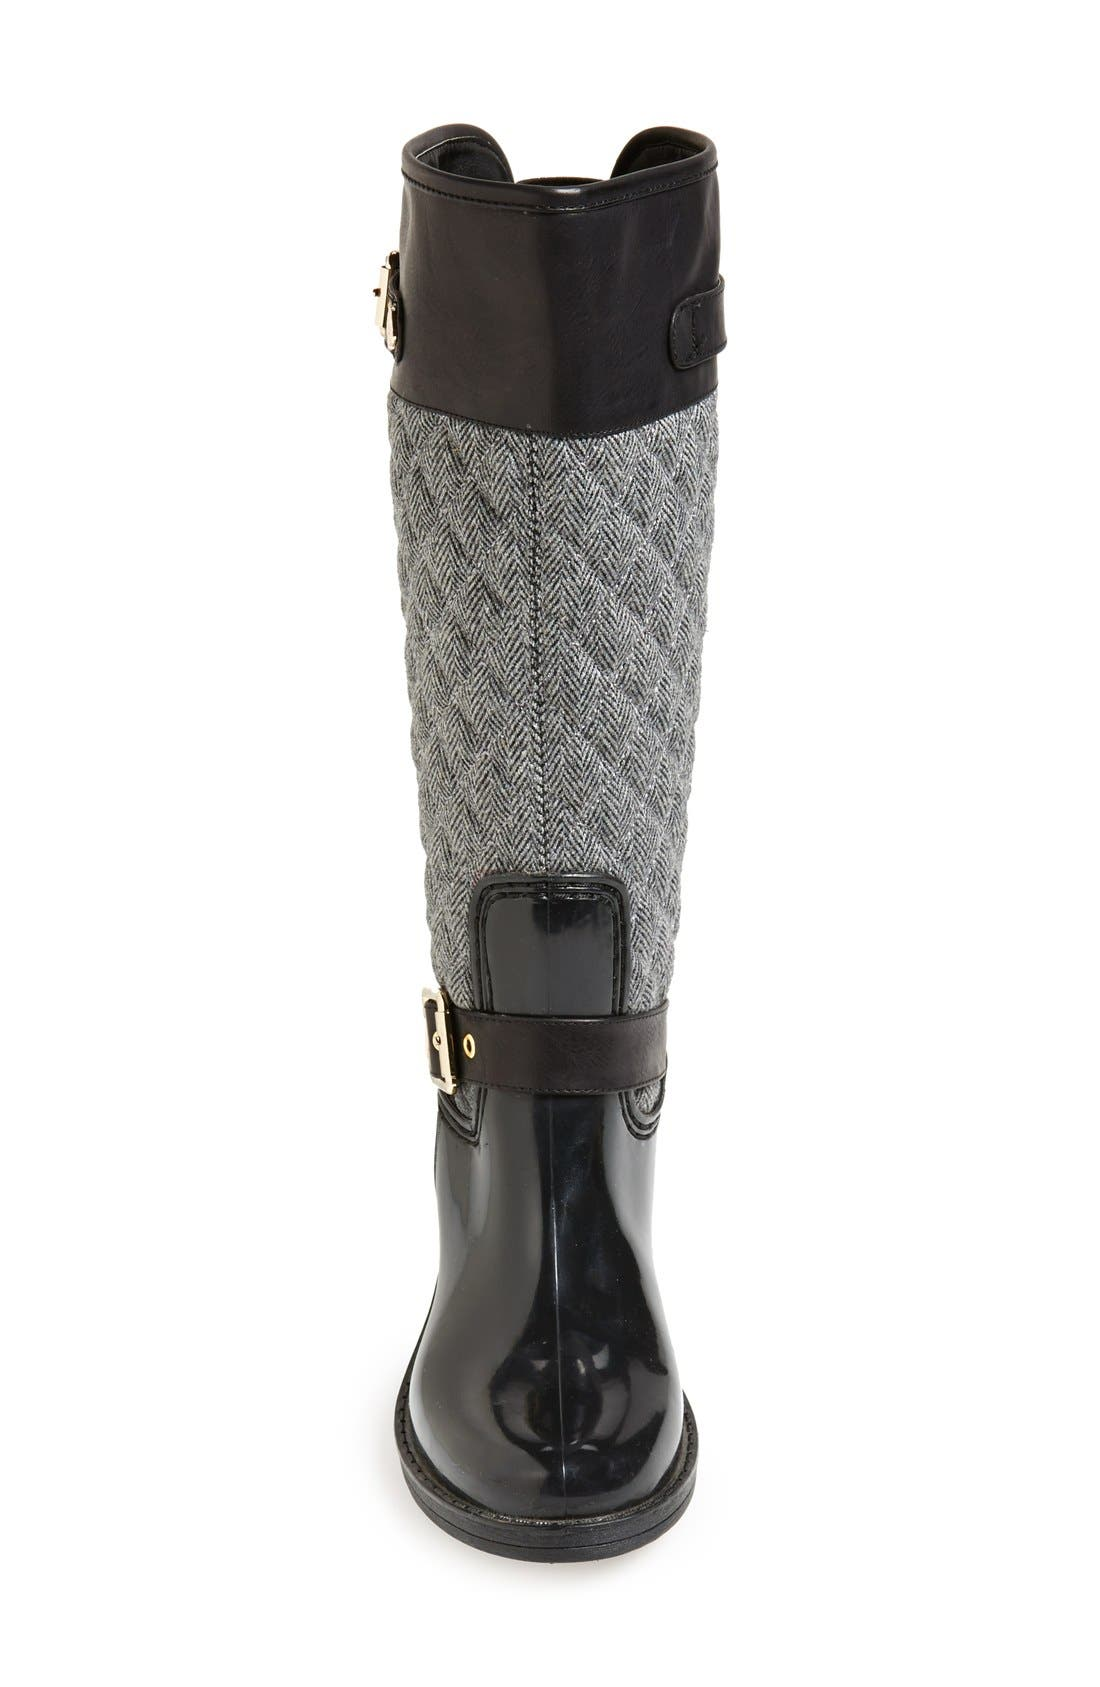 Alternate Image 3  - Posh Wellies 'Peacon' Quilted Tall Rain Boot (Women)